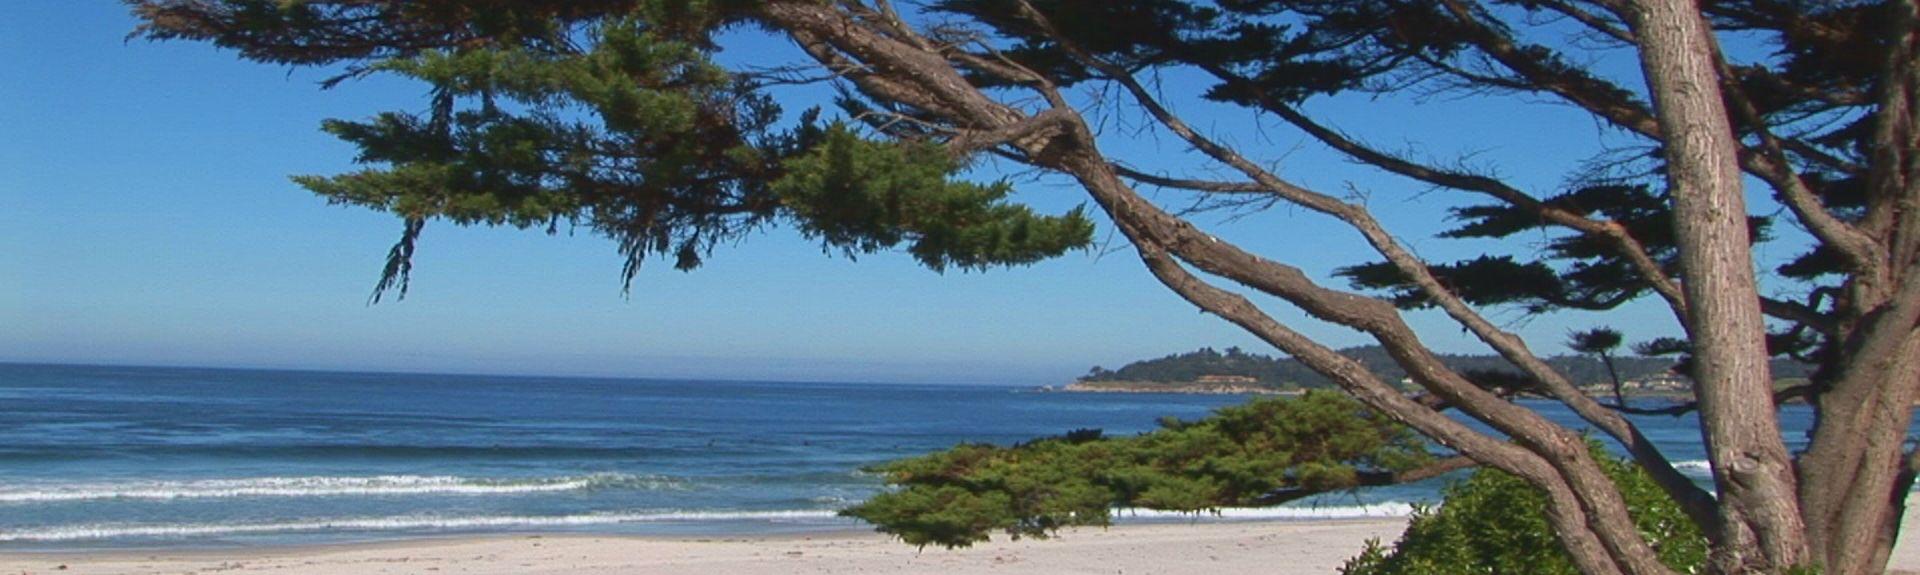 Moss Landing State Beach, Moss Landing, California, United States of America